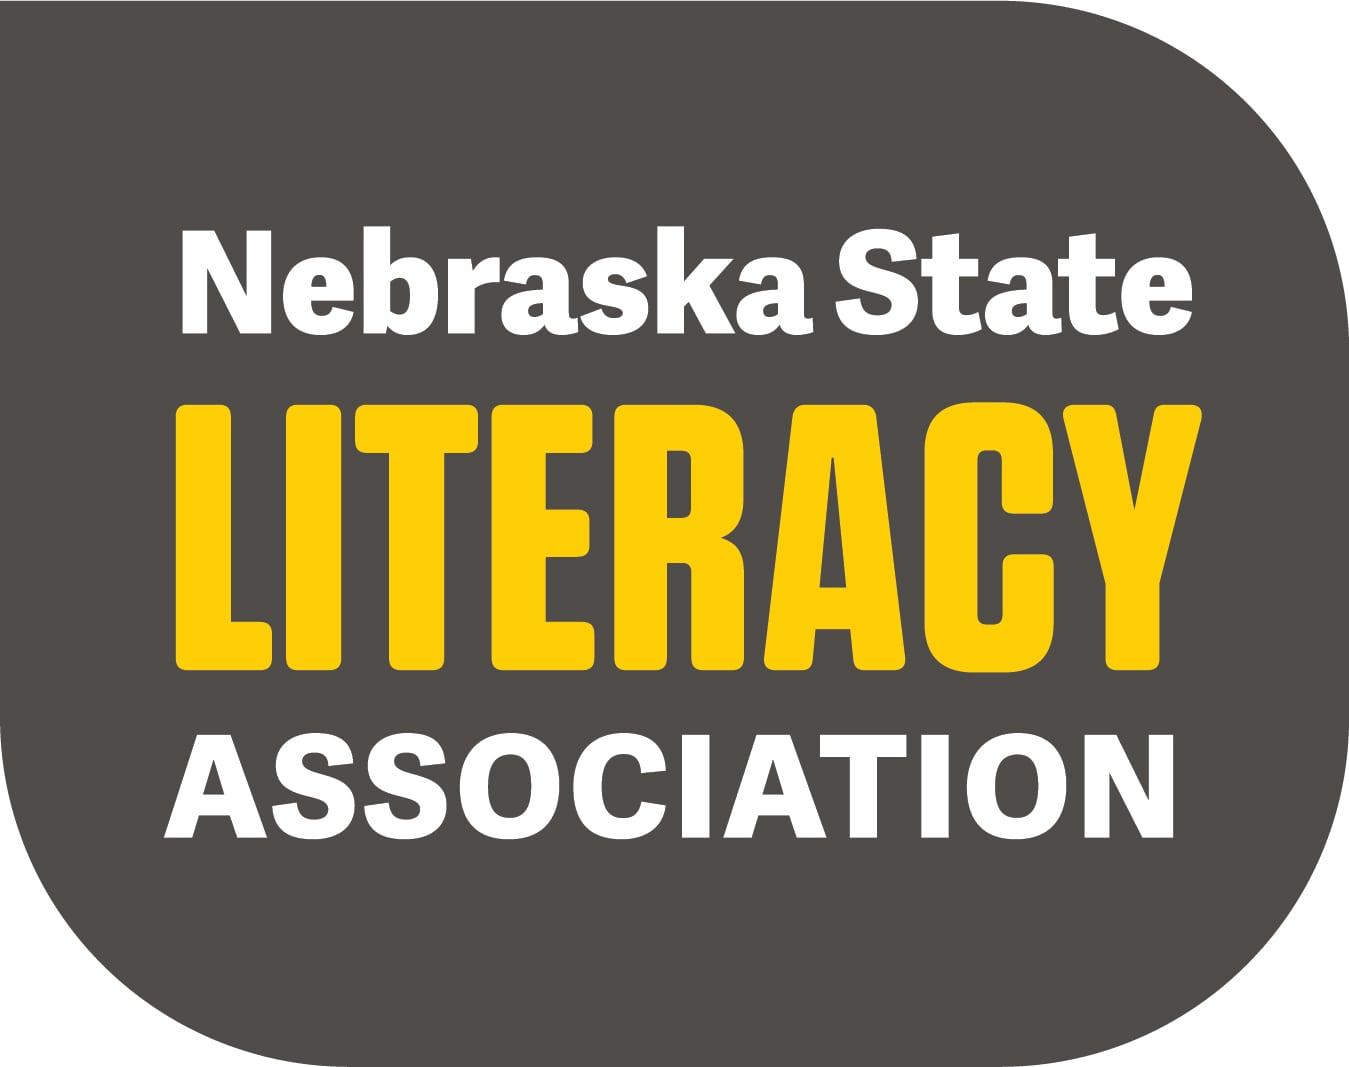 Nebraska State Literacy Association